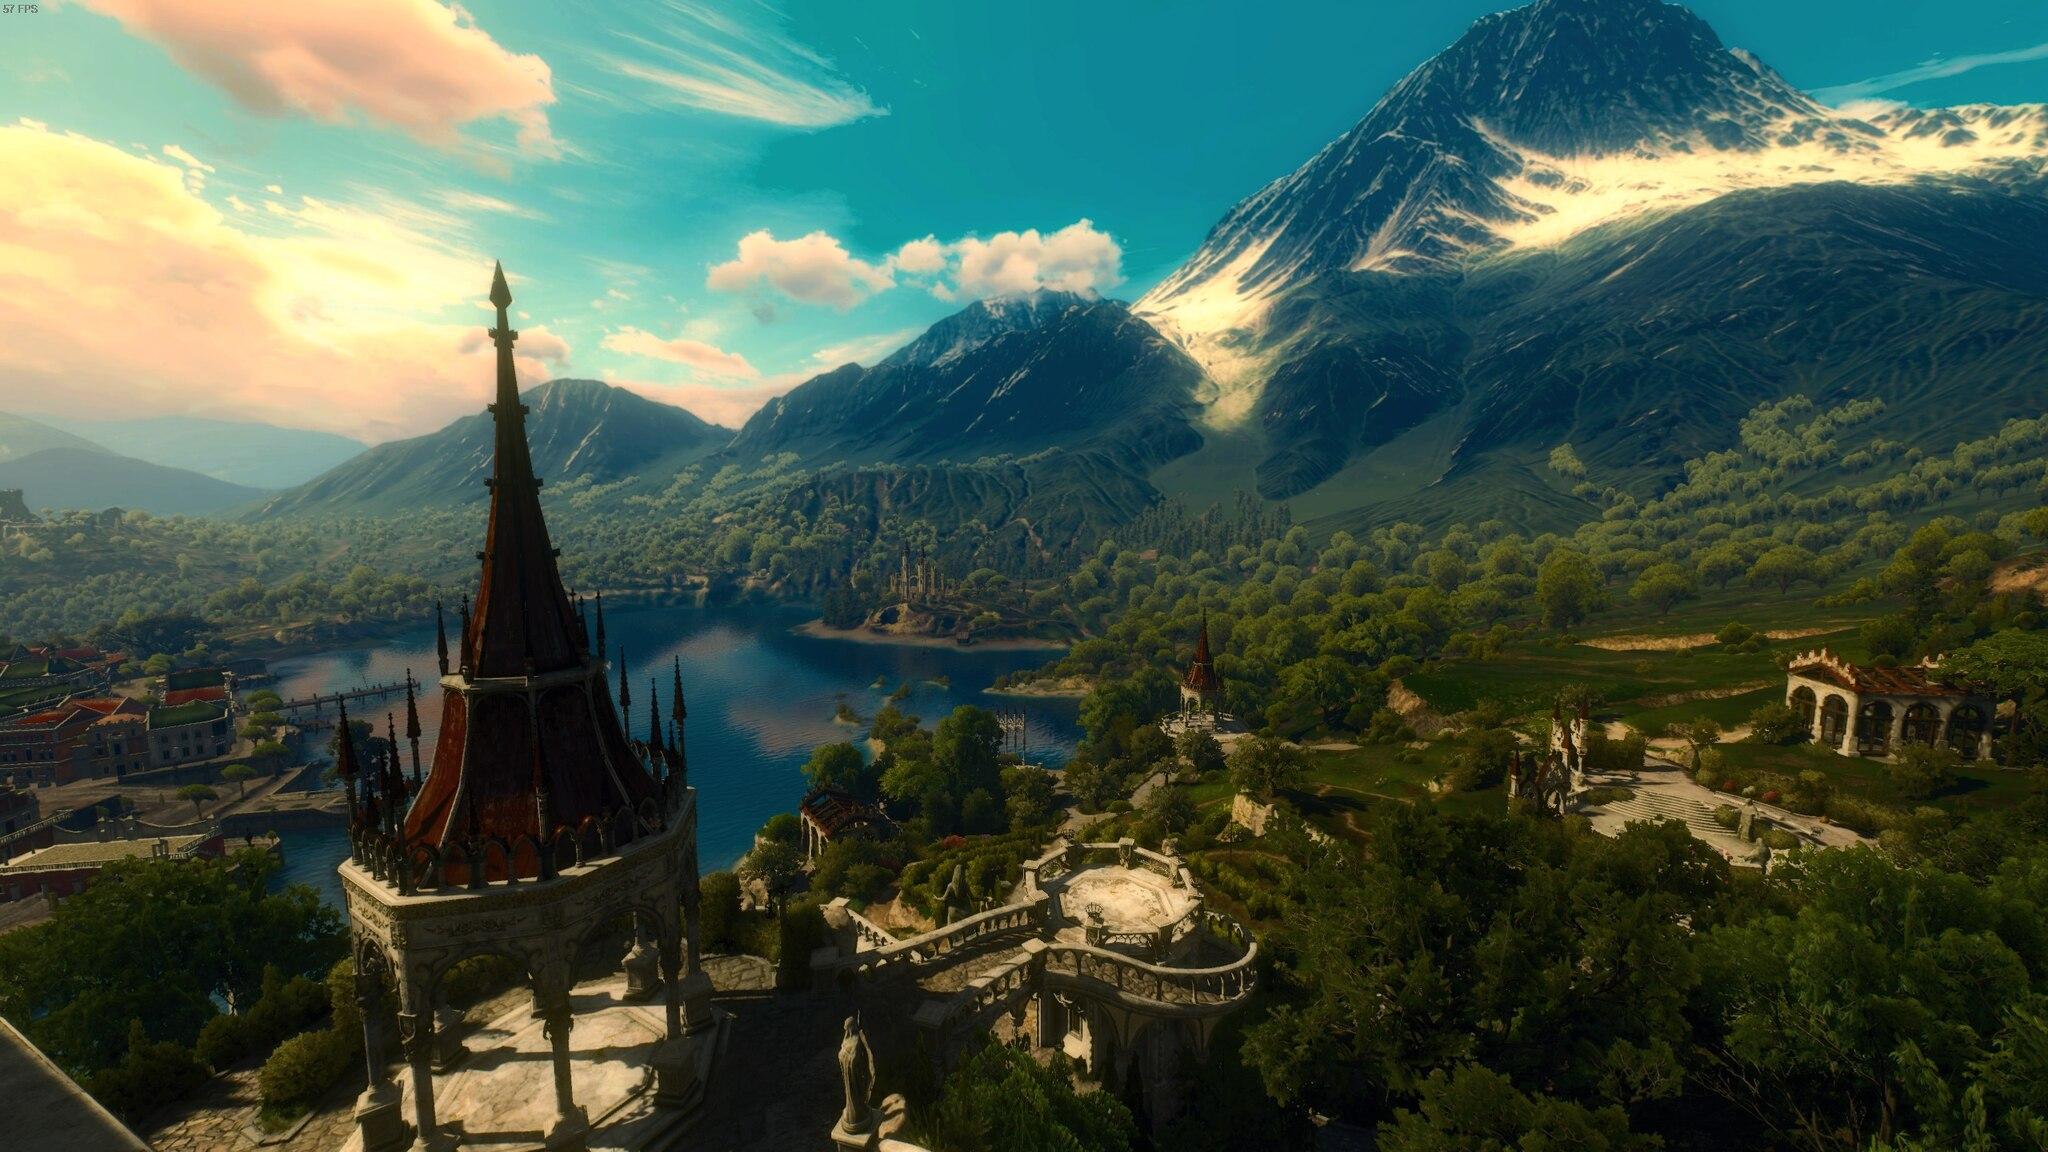 rdfgbdvfg.jpg - Witcher 3: Wild Hunt, the